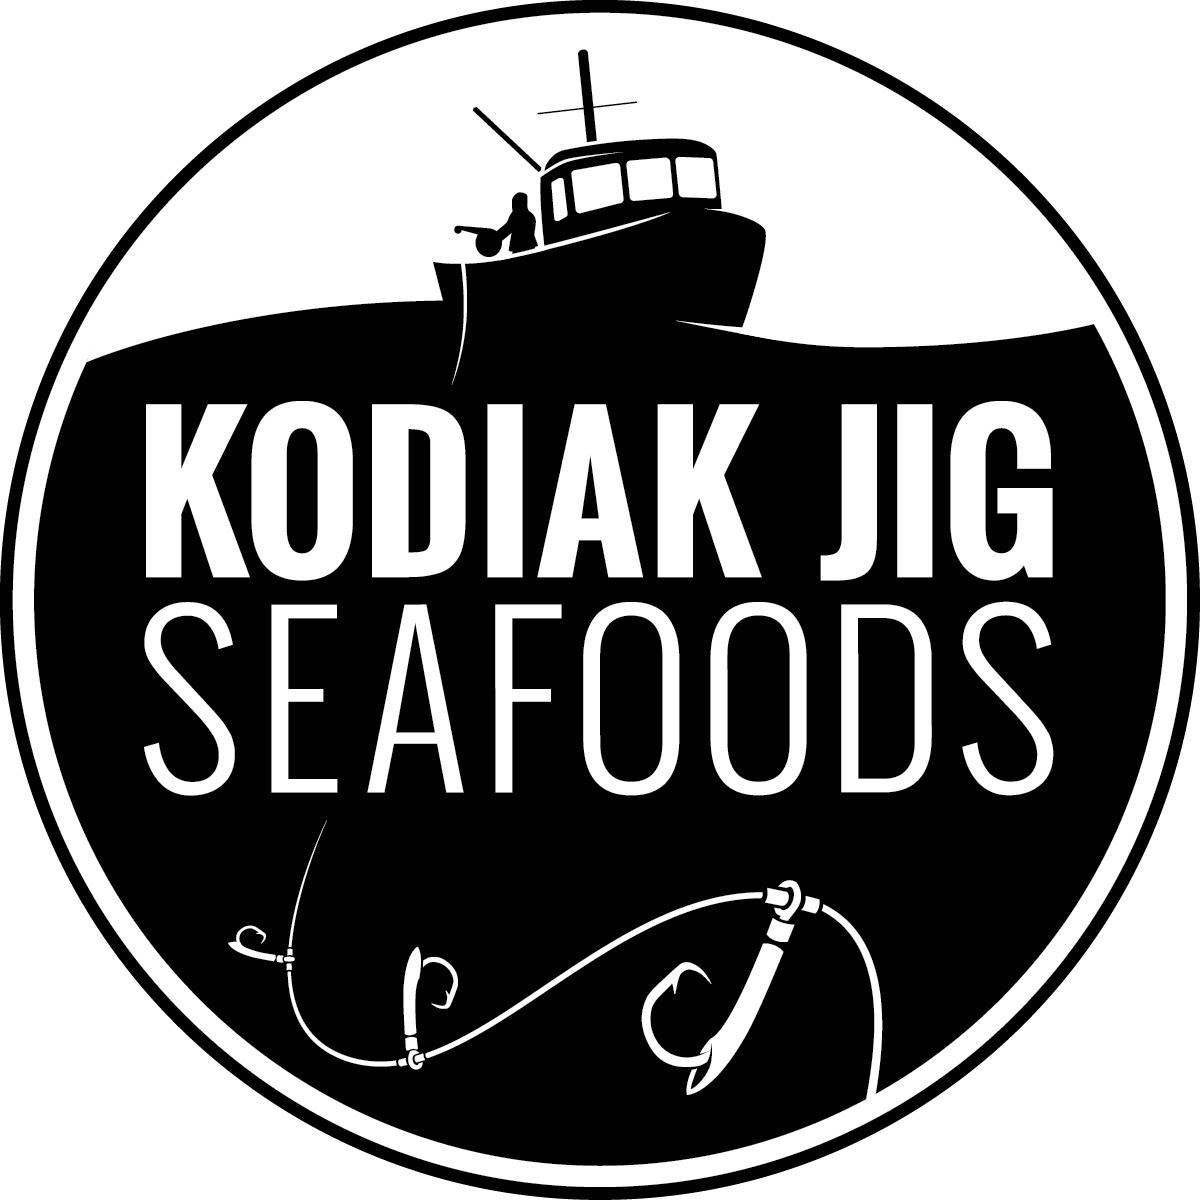 Kodiak-Jig-Seafoods-+Logo+.jpg